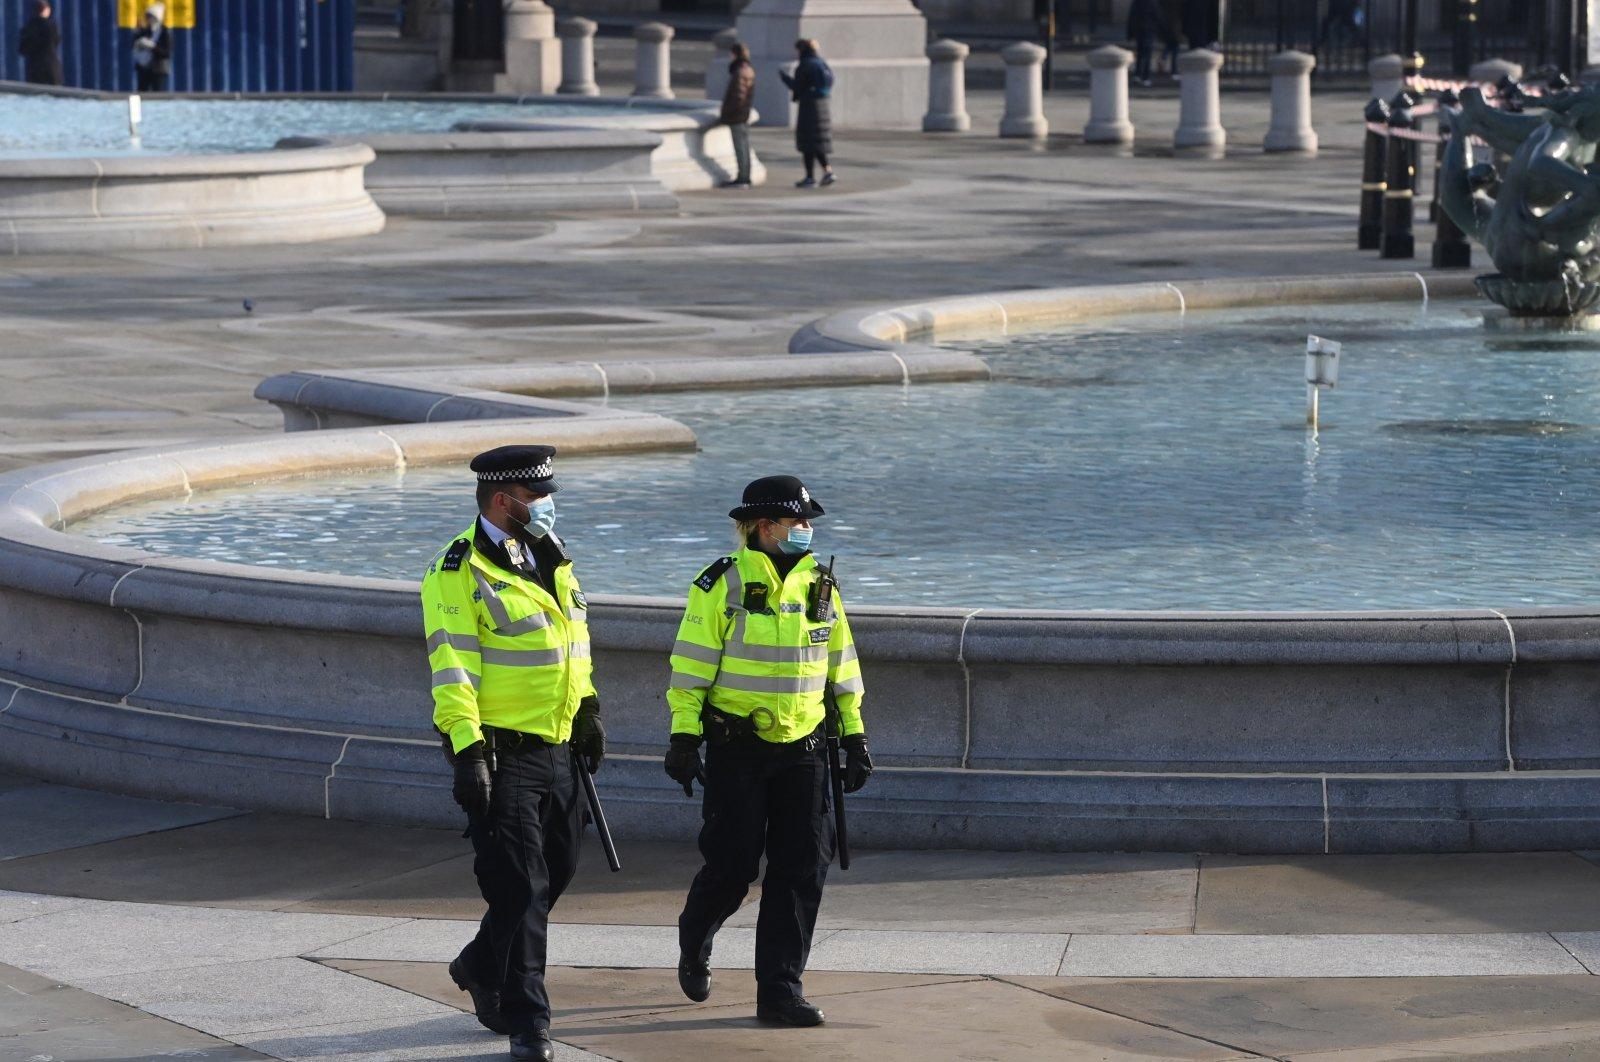 Police patrol Trafalgar square during the third national lockdown in London, Britain, Jan. 23, 2021. (EPA Photo)